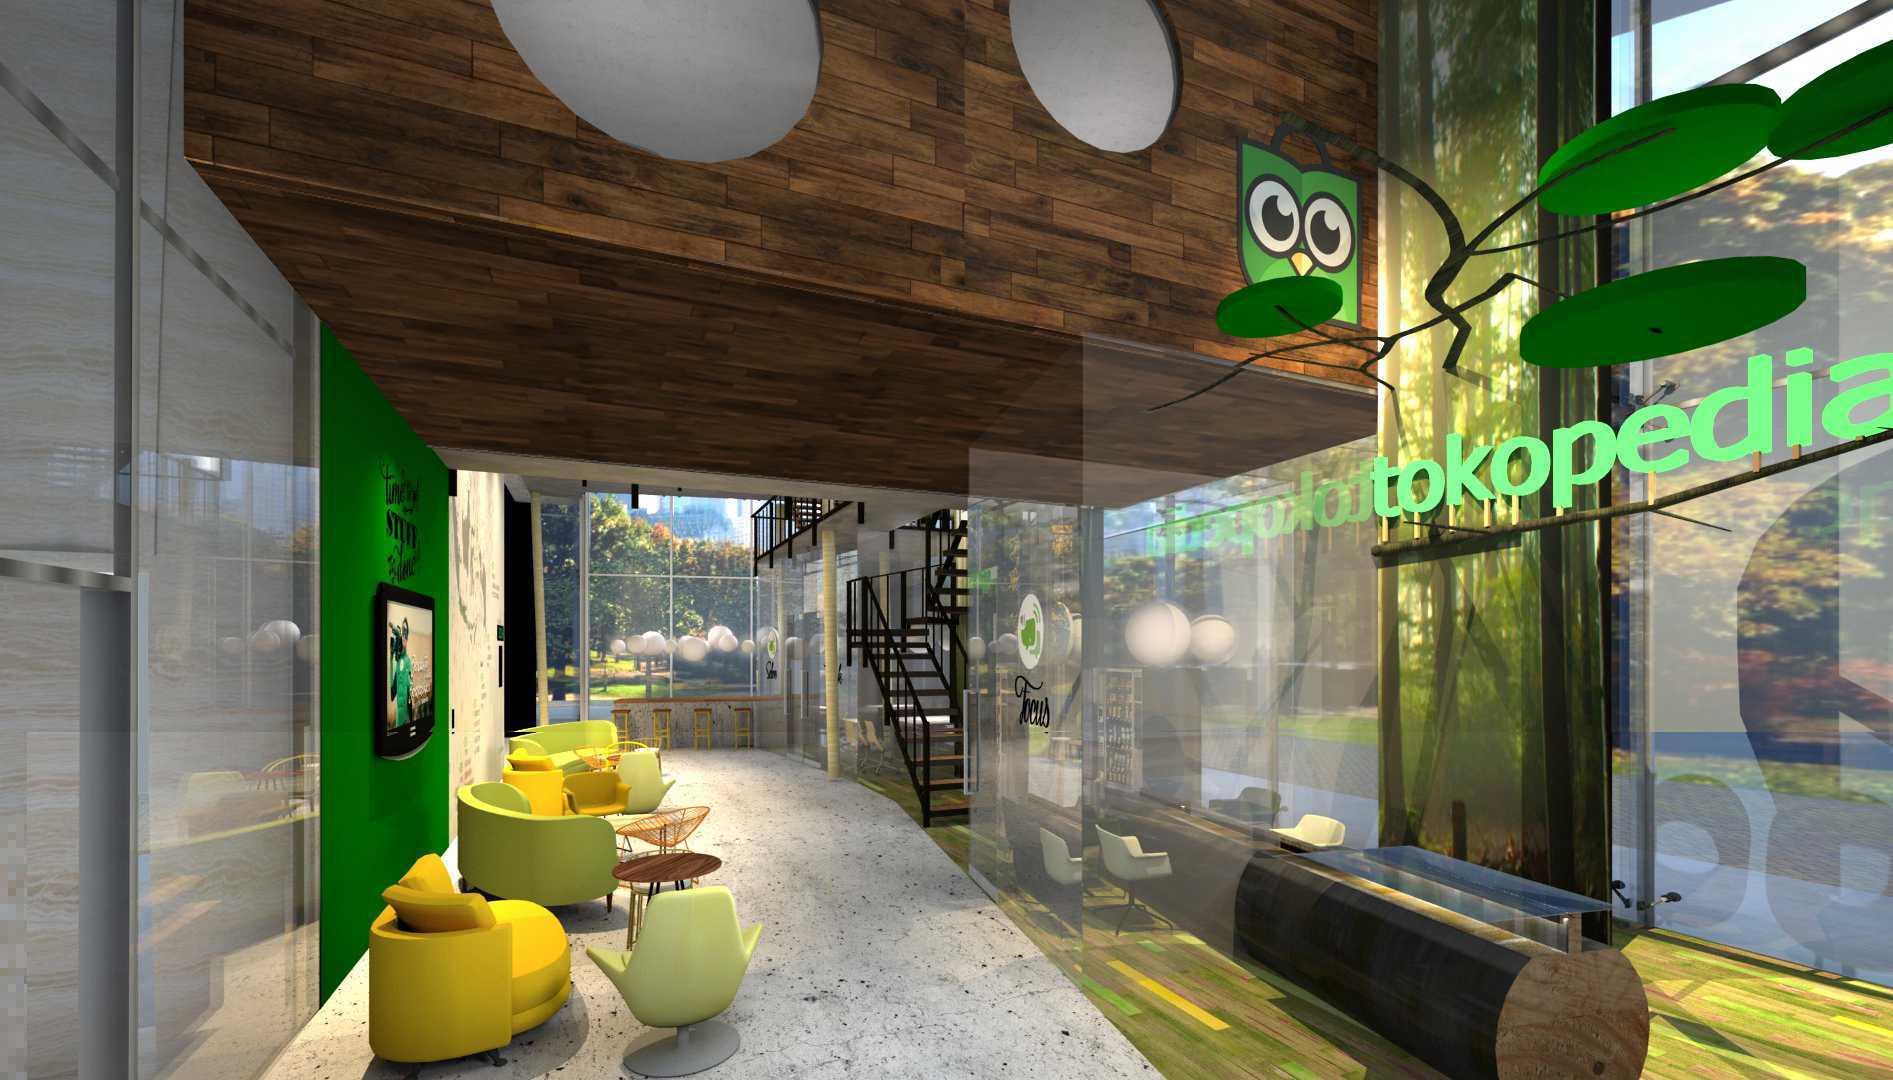 Tms Creative Tokopedia Care Office Jl. Lkr. Luar Bar., Kota Jakarta Barat, Daerah Khusus Ibukota Jakarta, Indonesia  Tms-Creative-Tokopedia-Care-Office Modern  56638